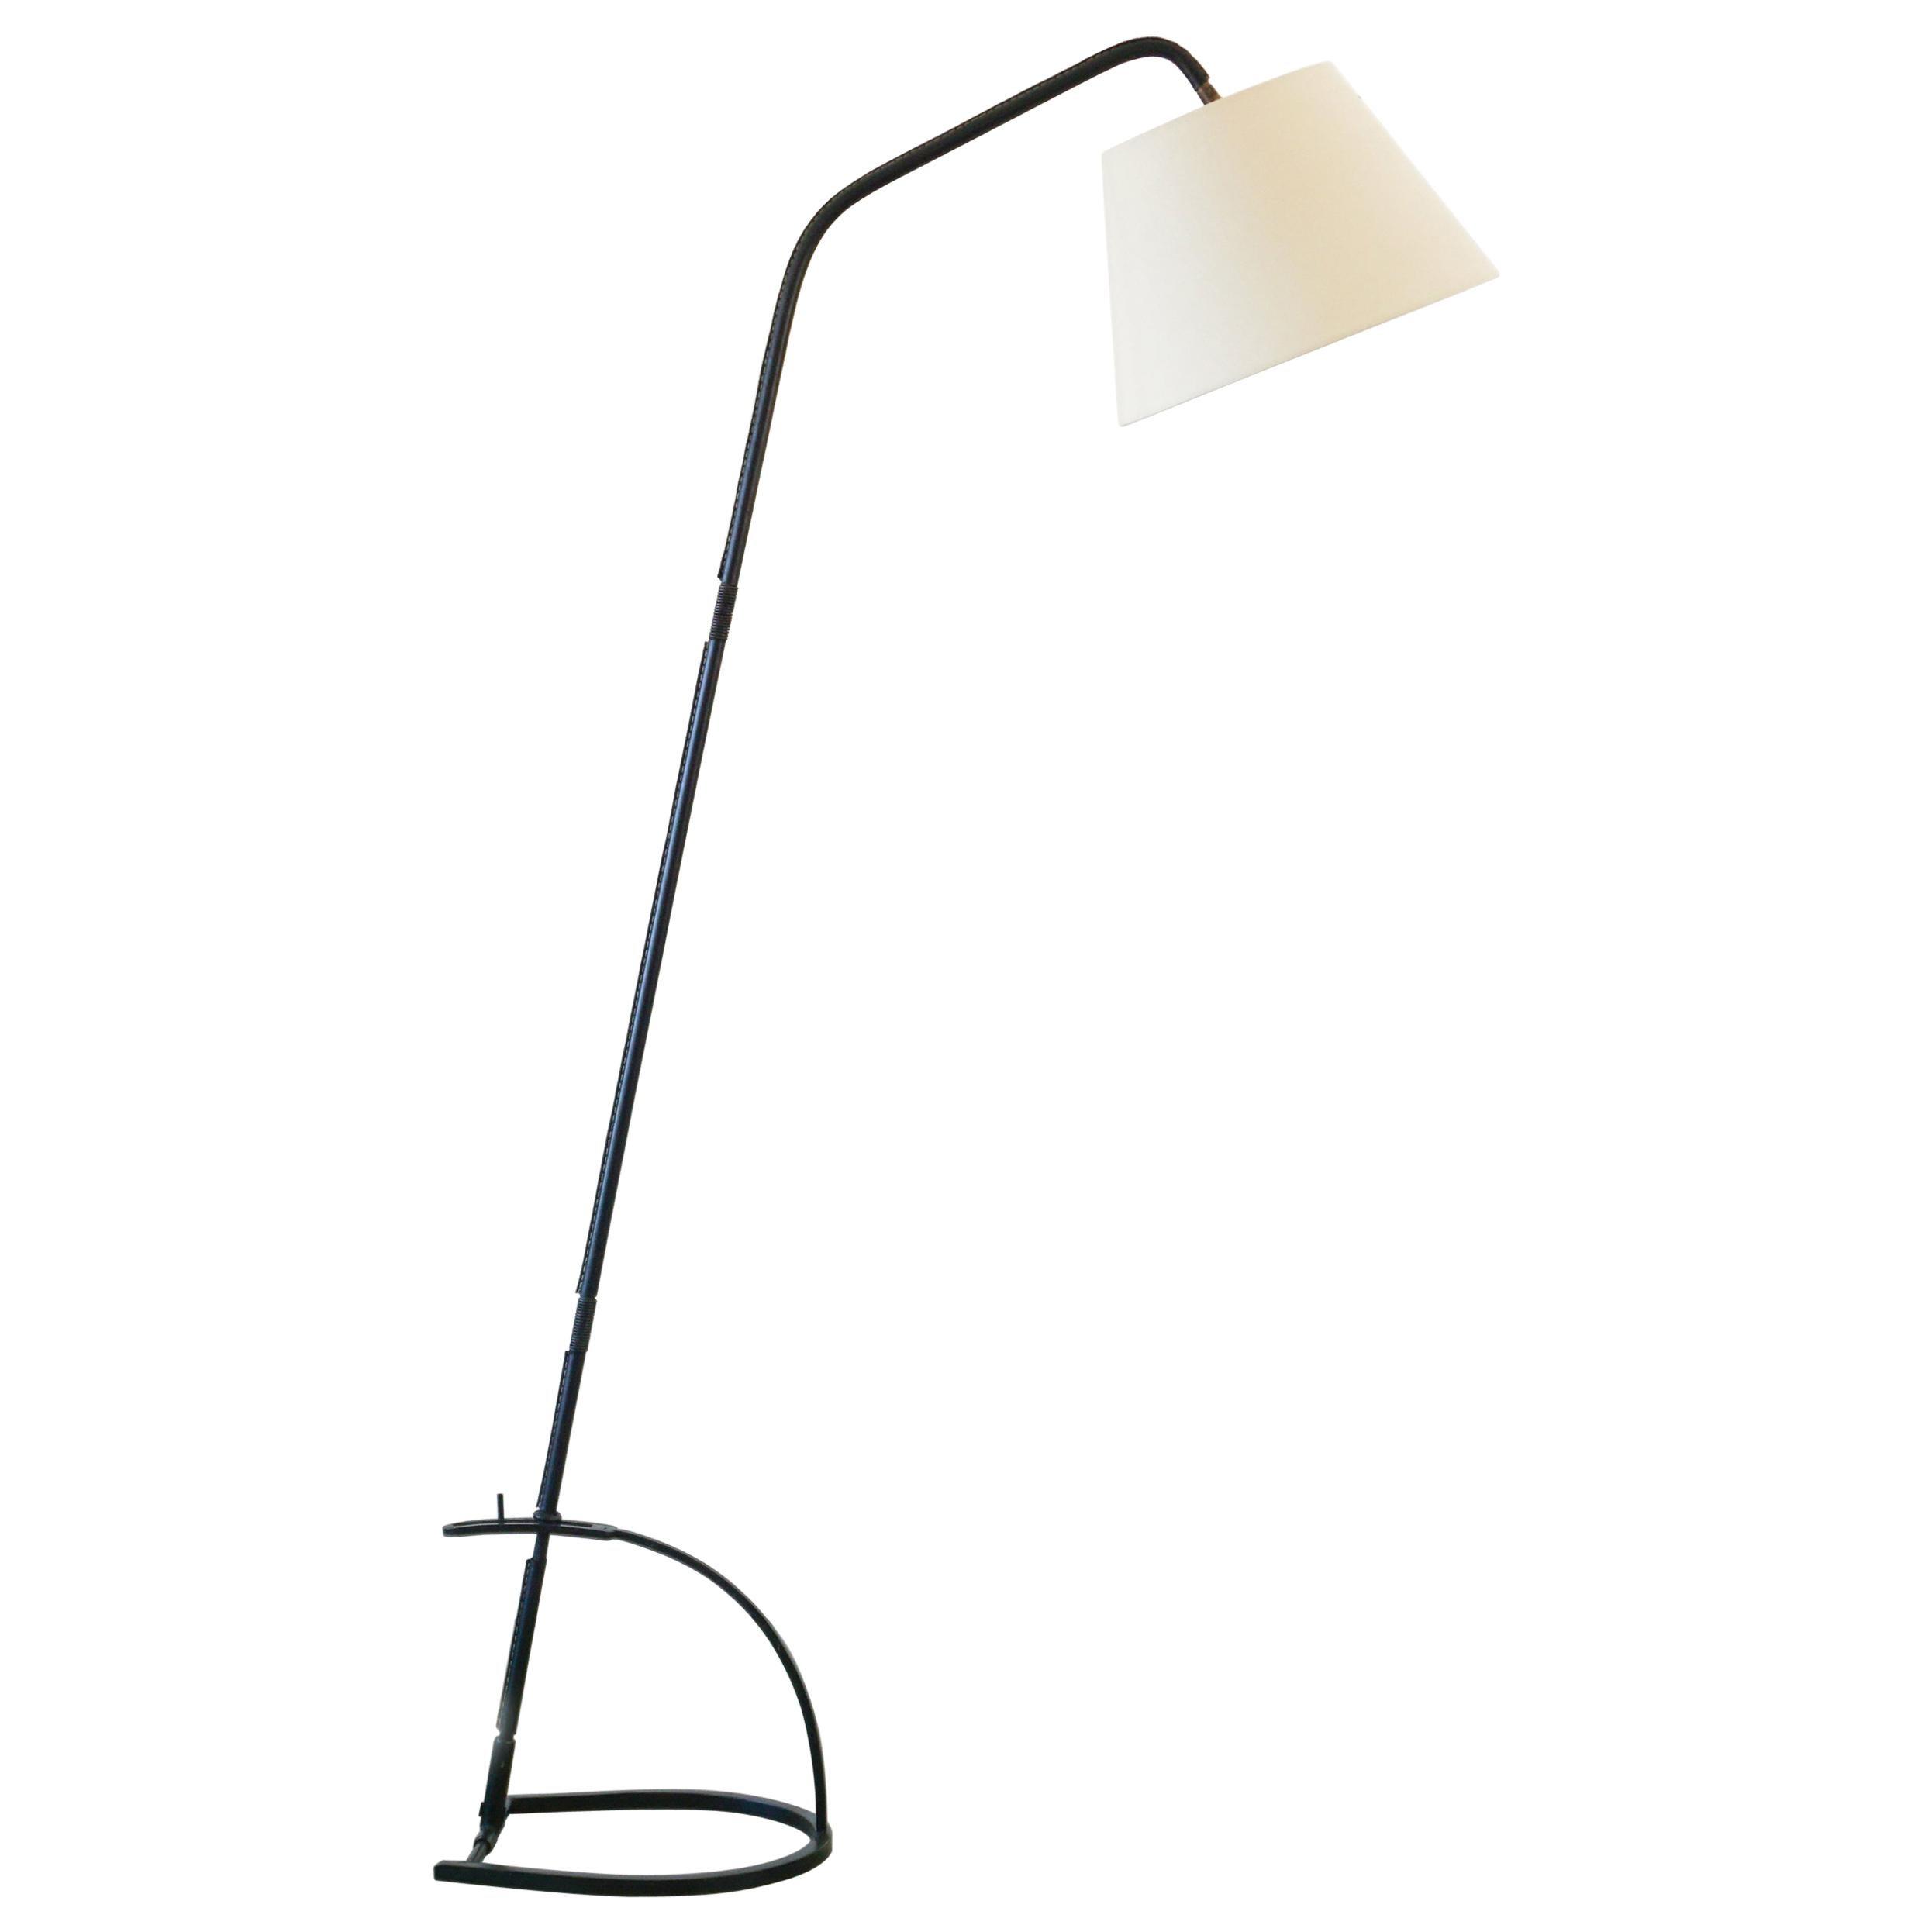 Jacques Adnet Adjustable Floor Lamp